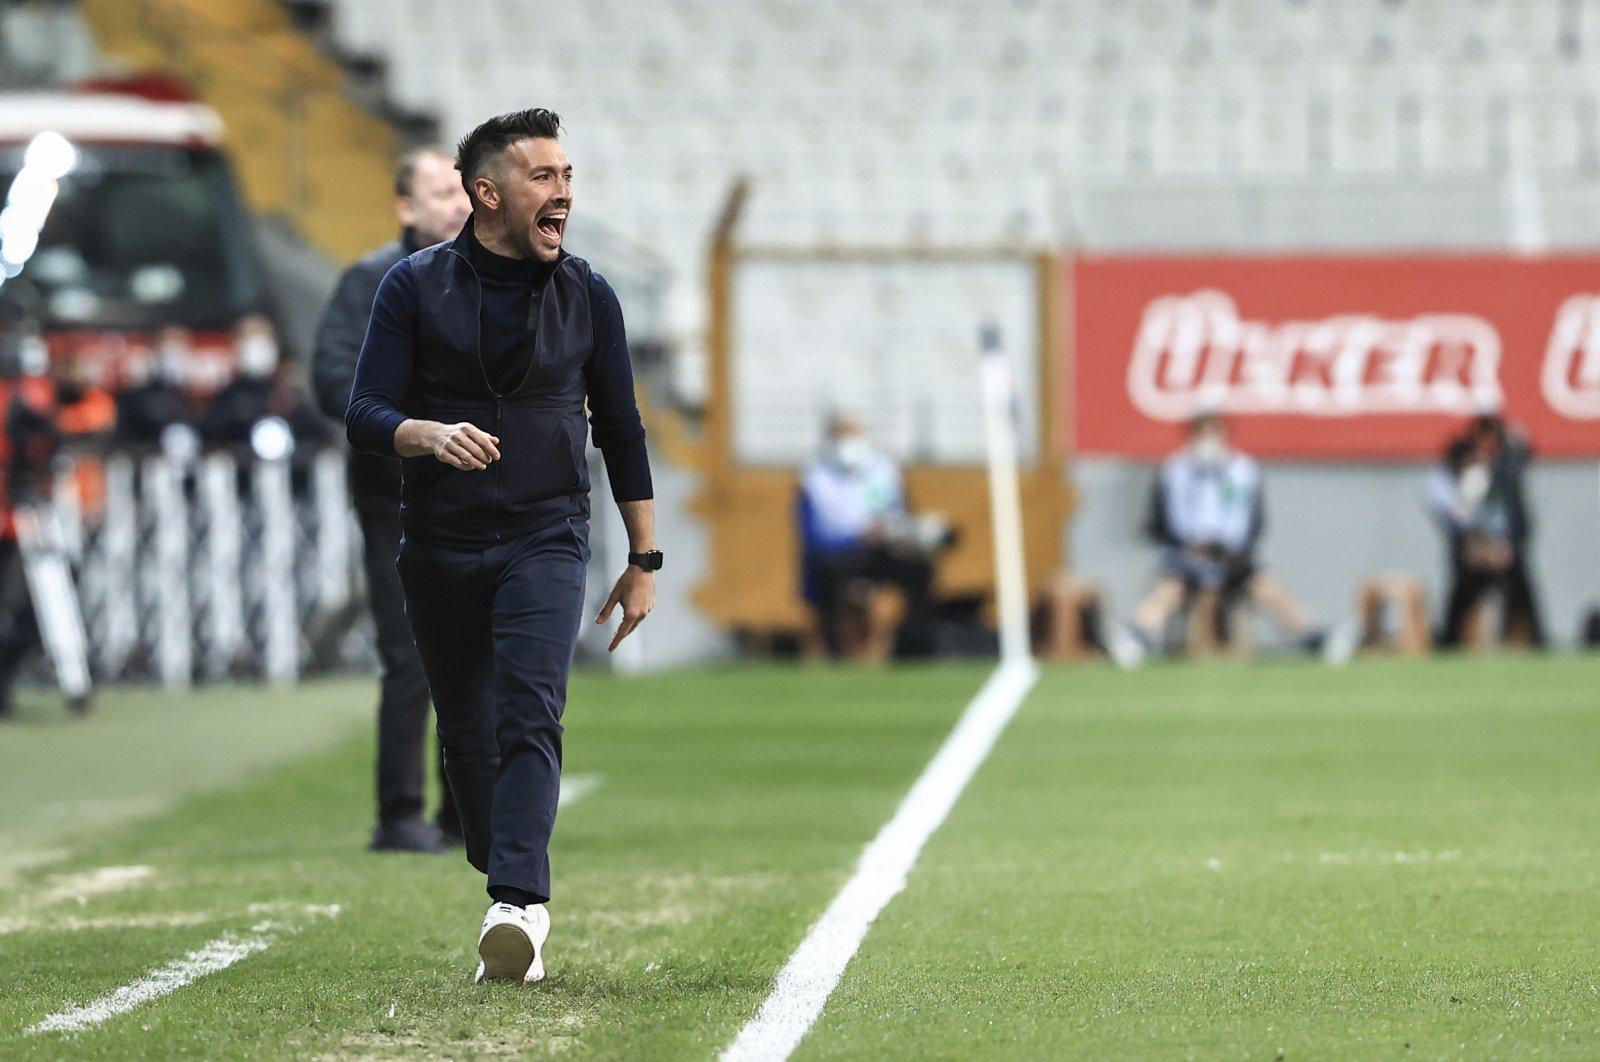 Fatih Karagümrük manager Francesco Farioli reacts during a Süper Lig match against Beşiktaş, Istanbul, Turkey, May 11, 2021. (AA Photo)